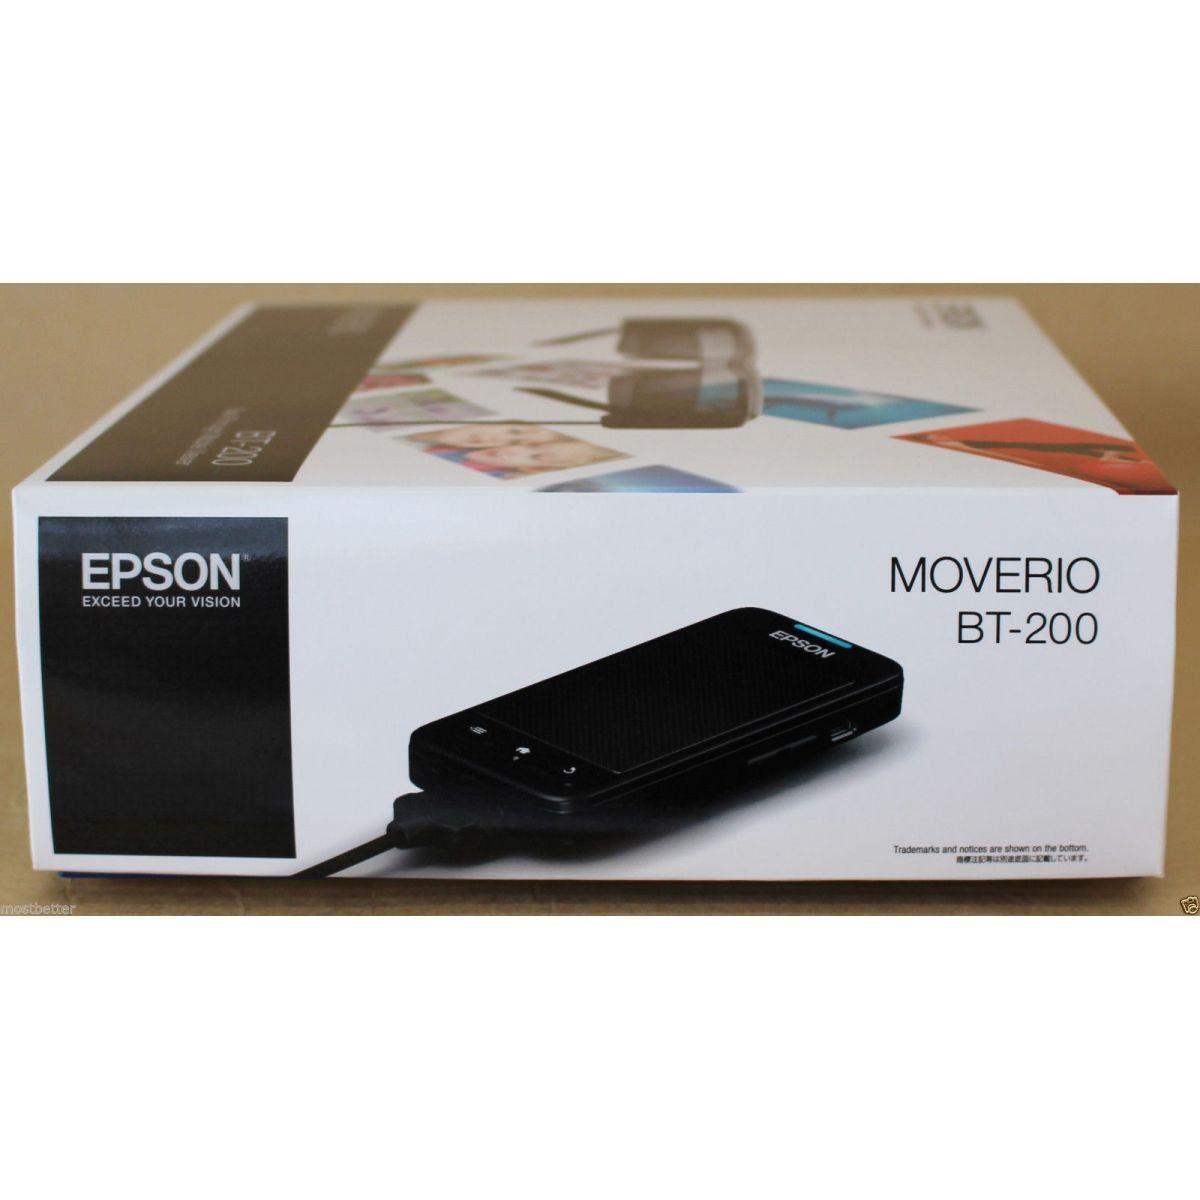 Epson Moverio Bt-200 Smart Glass